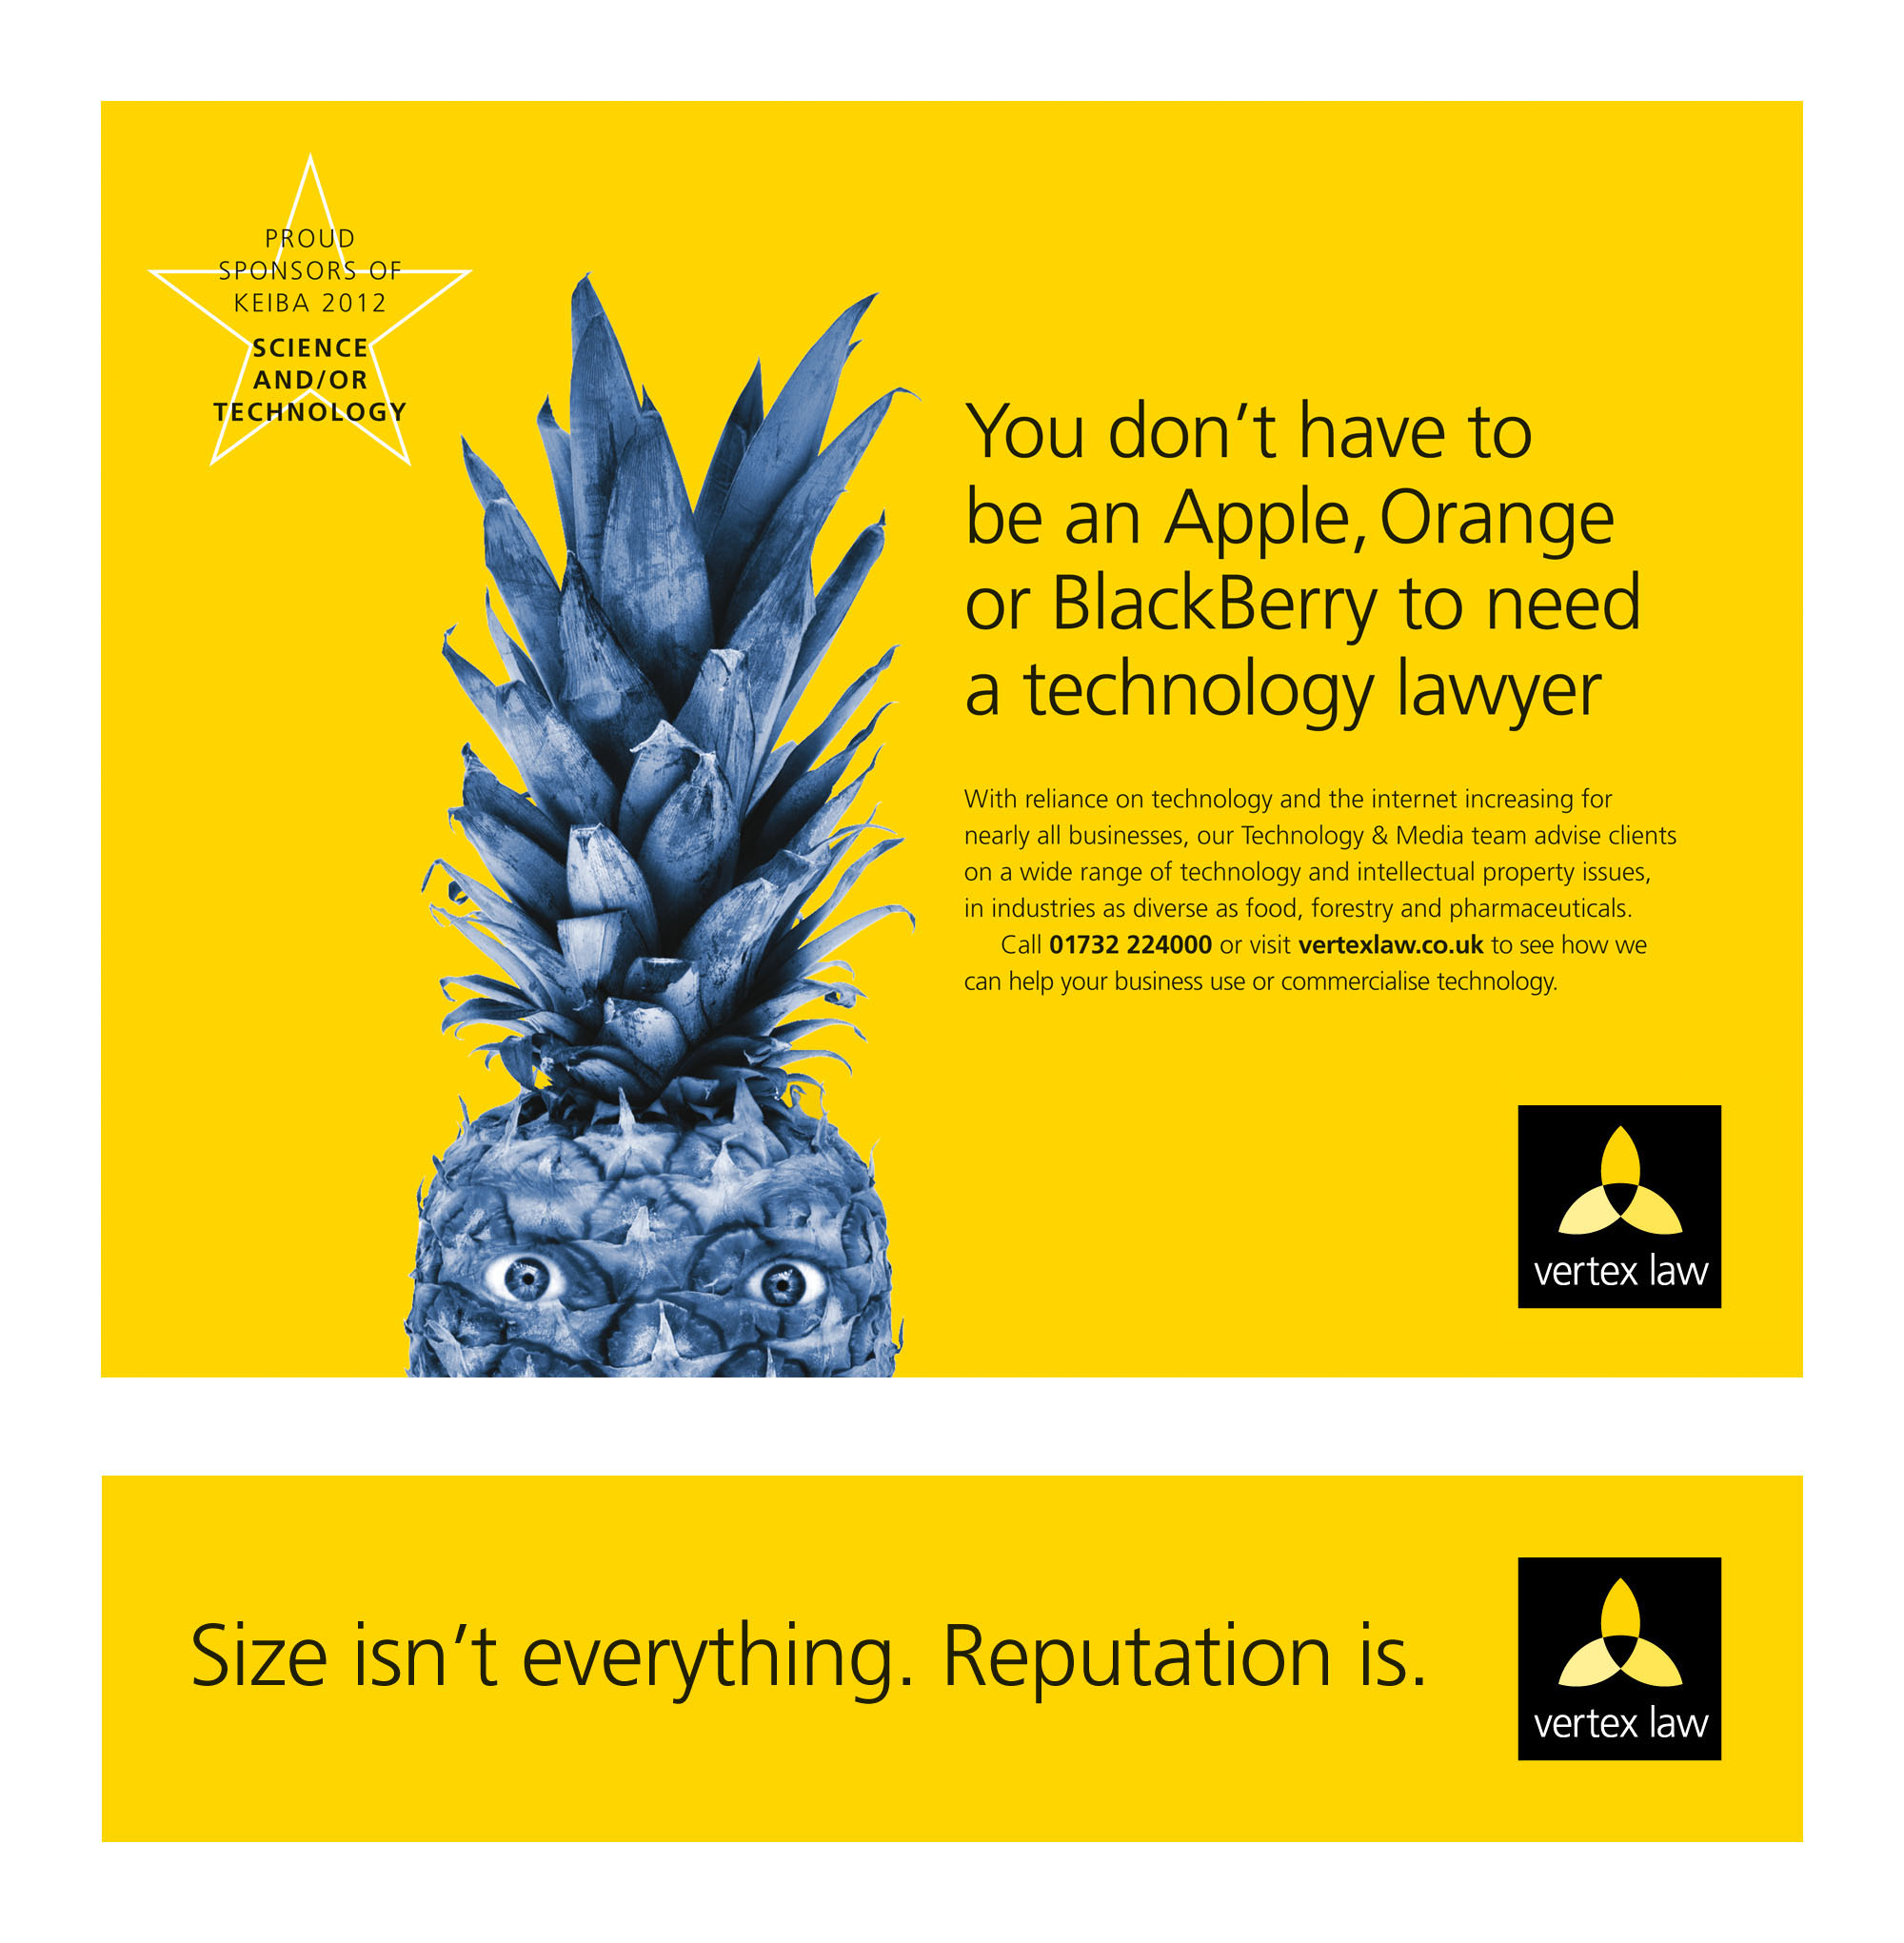 Vertex Law technology team ad